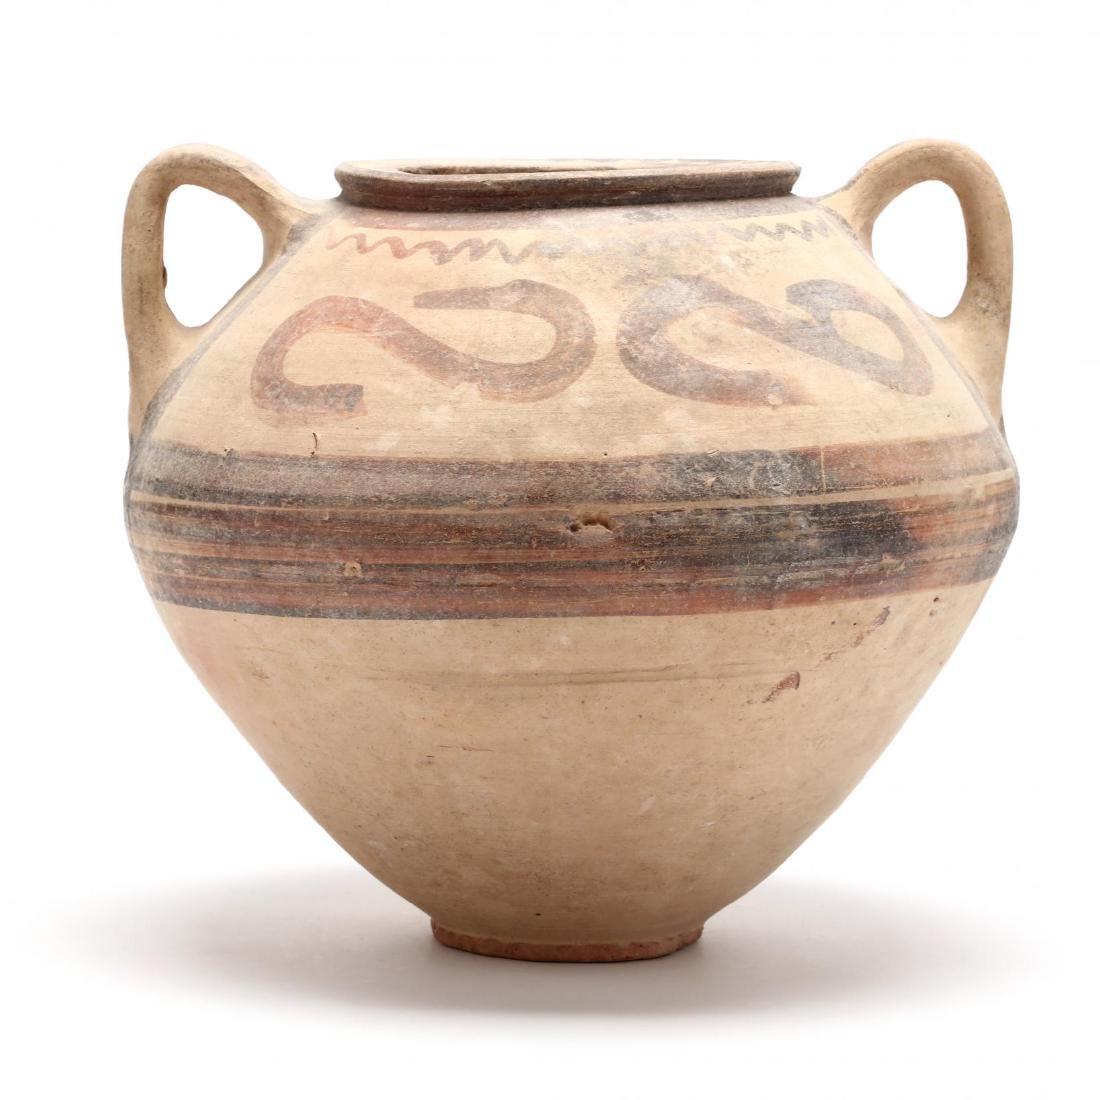 Cypro-Archaic Bichrome Large Jar